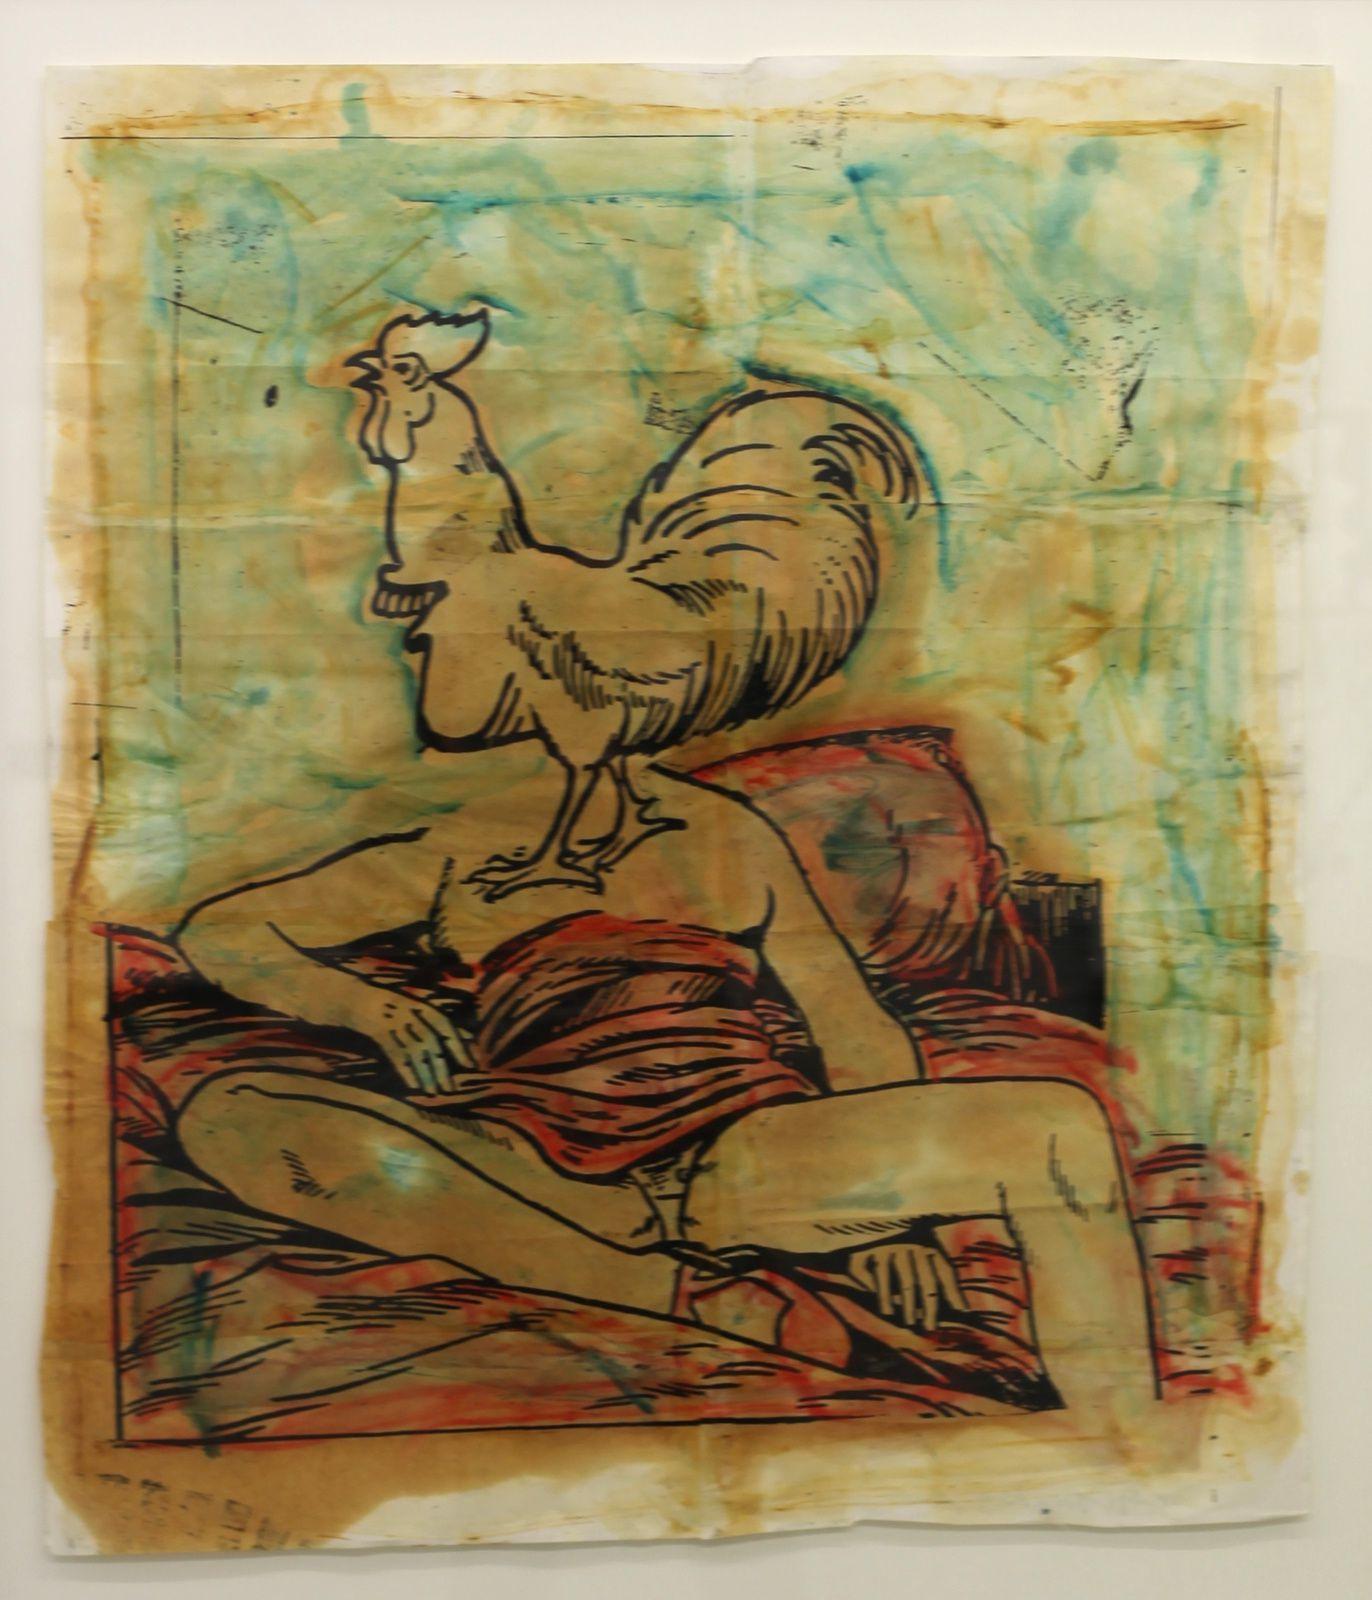 """She sand to rare reggae"", 2005 de Steve GIANAKOS - Courtesy Galerie Semiose © Photo Éric Simon"